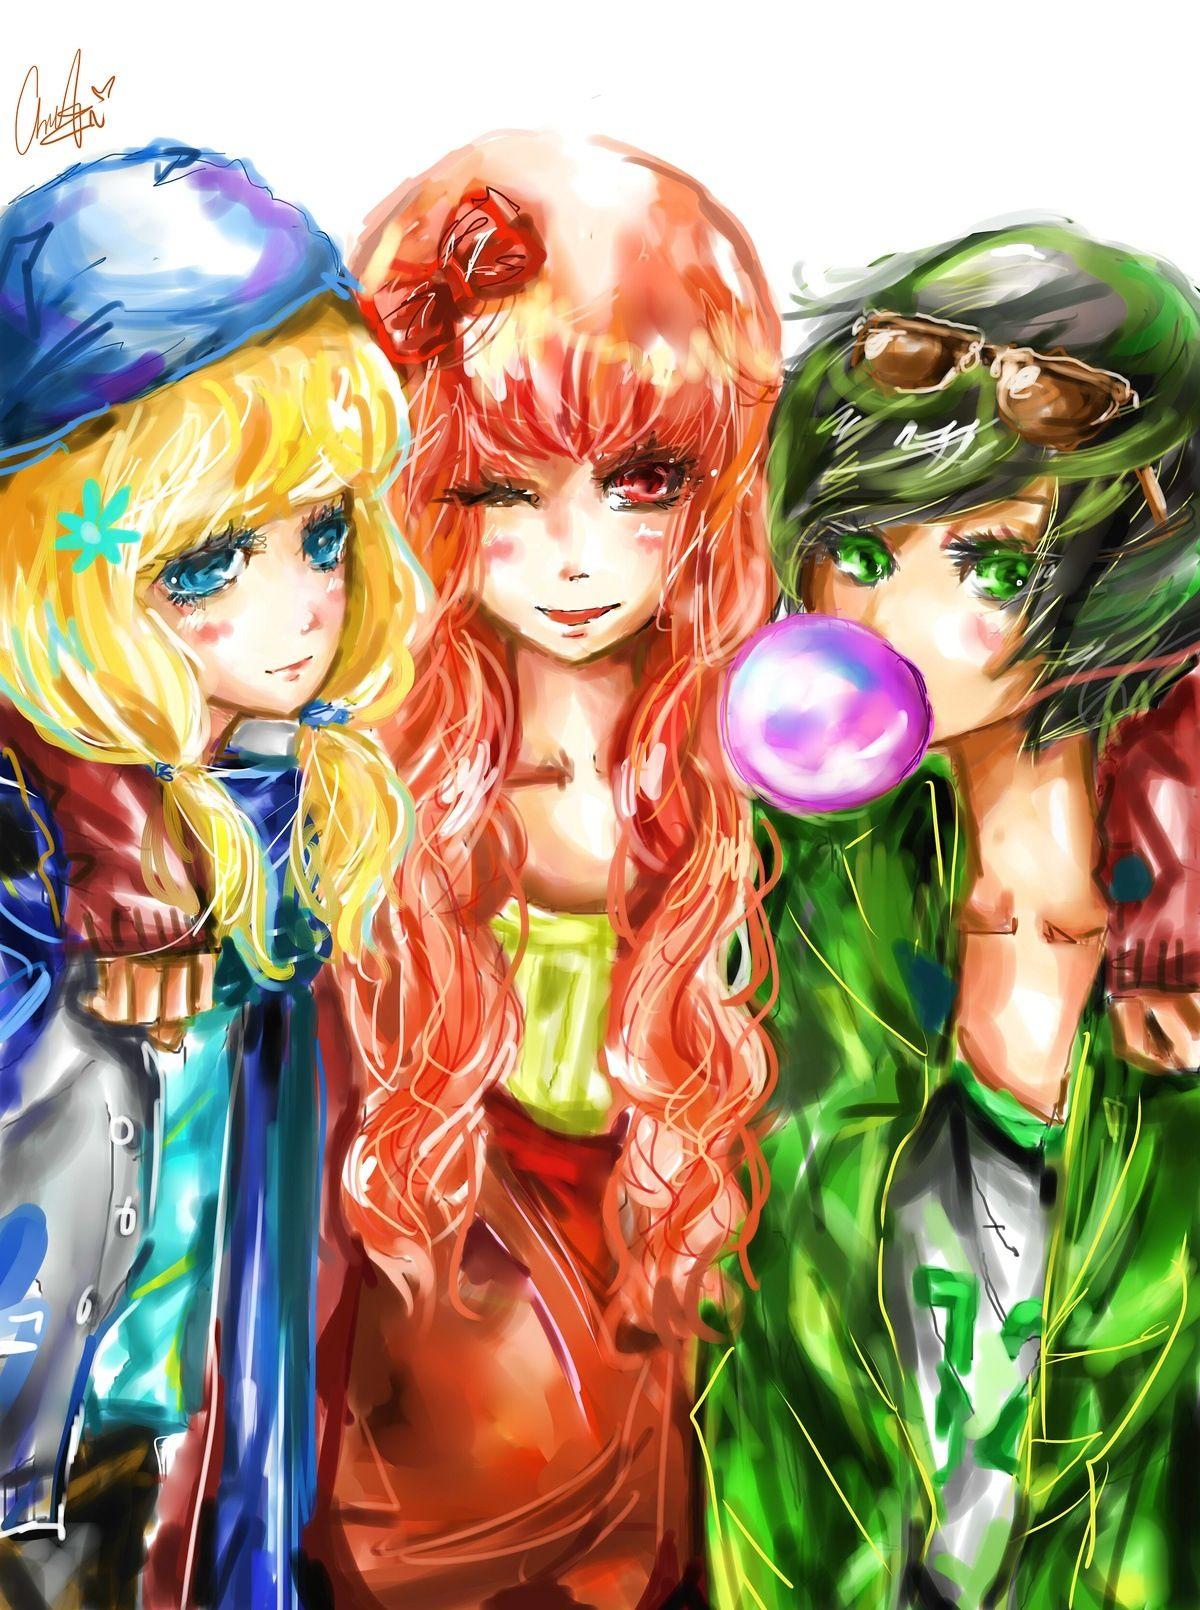 Pin by Avolon Chan on Toons Powerpuff girls anime